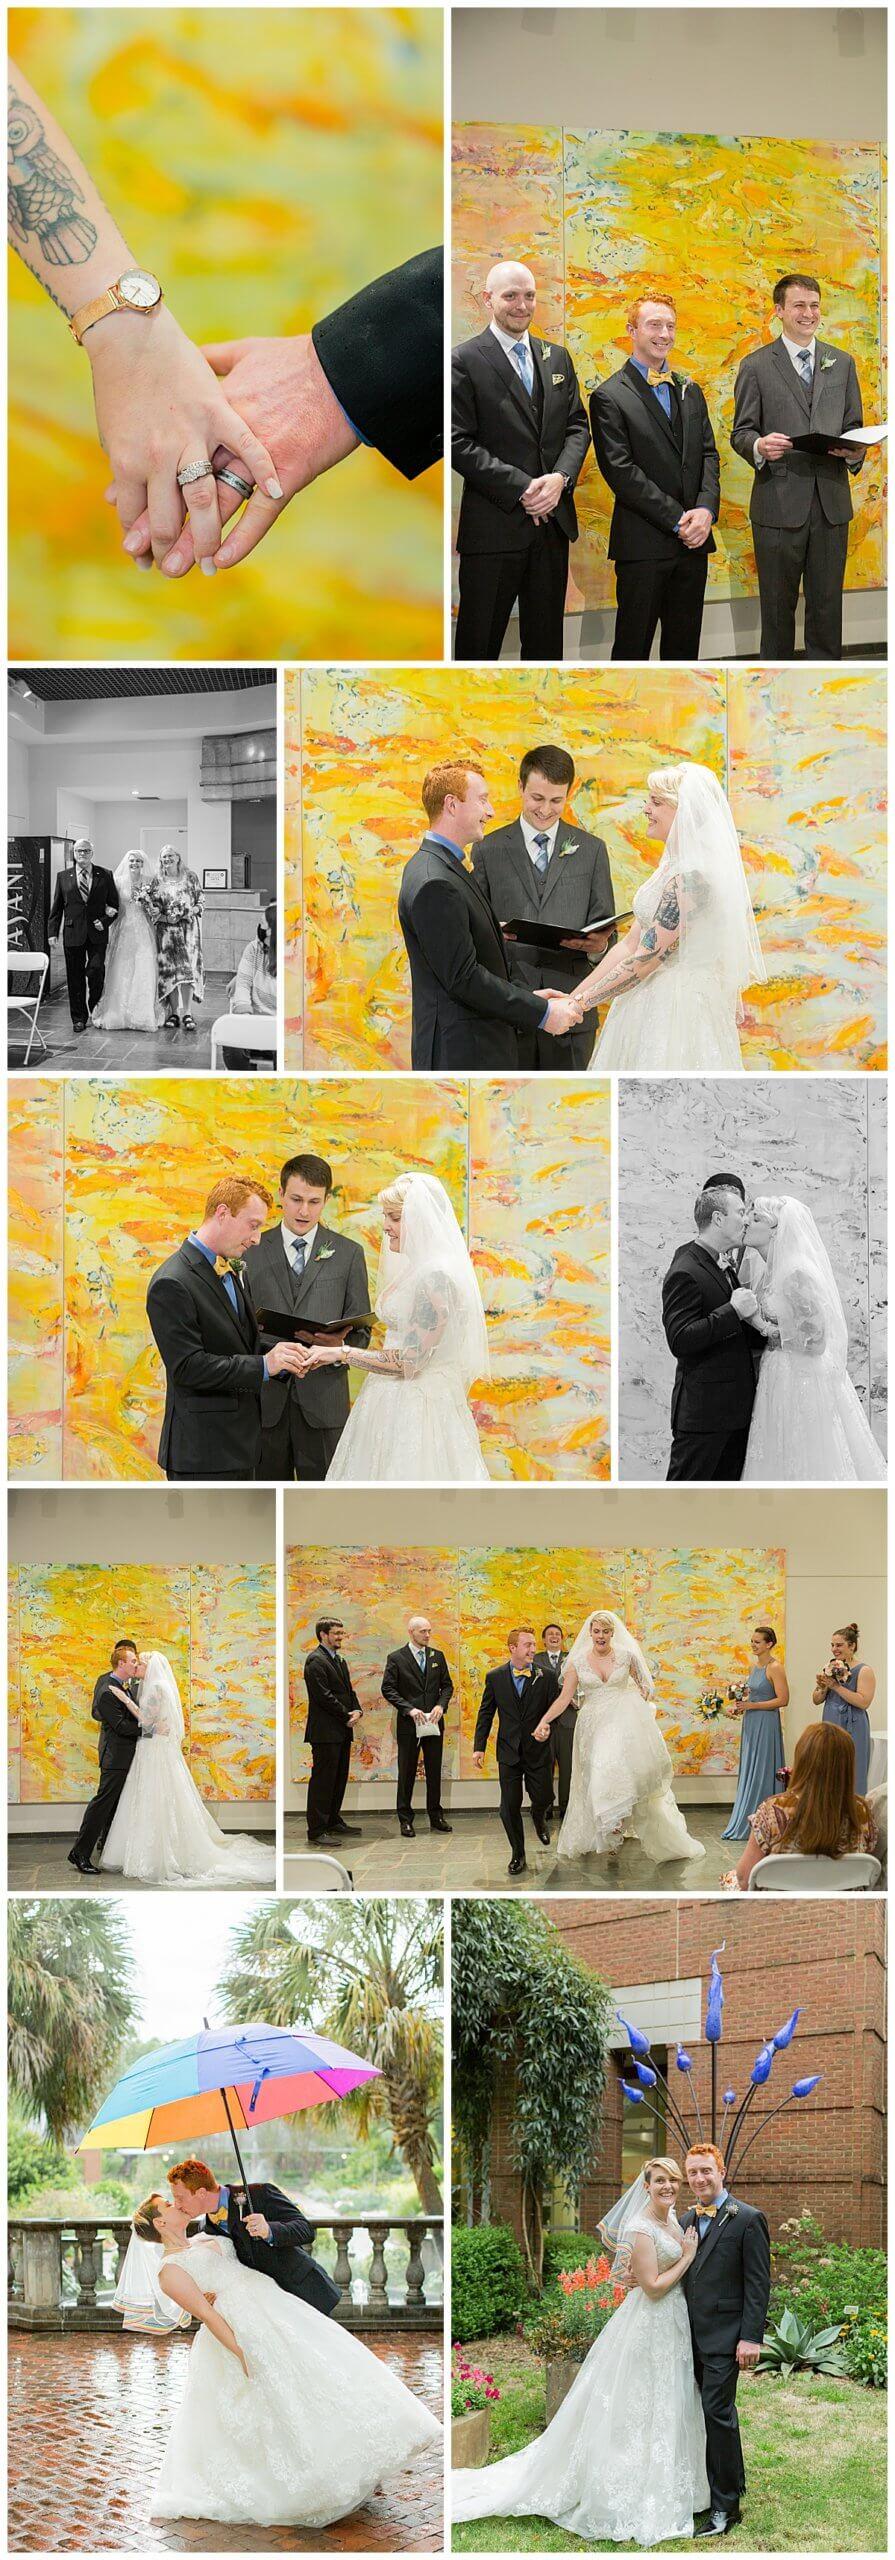 Riverbanks Zoo Botanical Gardens Wedding Ceremony